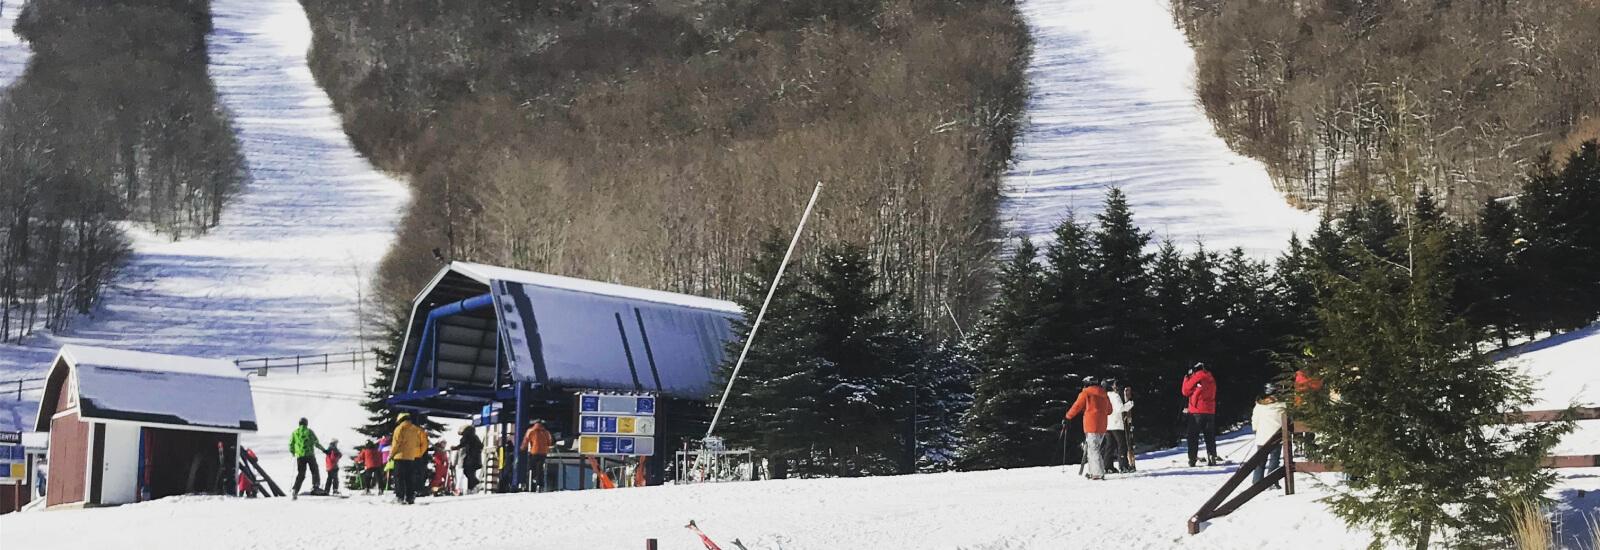 ski lift on a snowy mountaintop midwinter